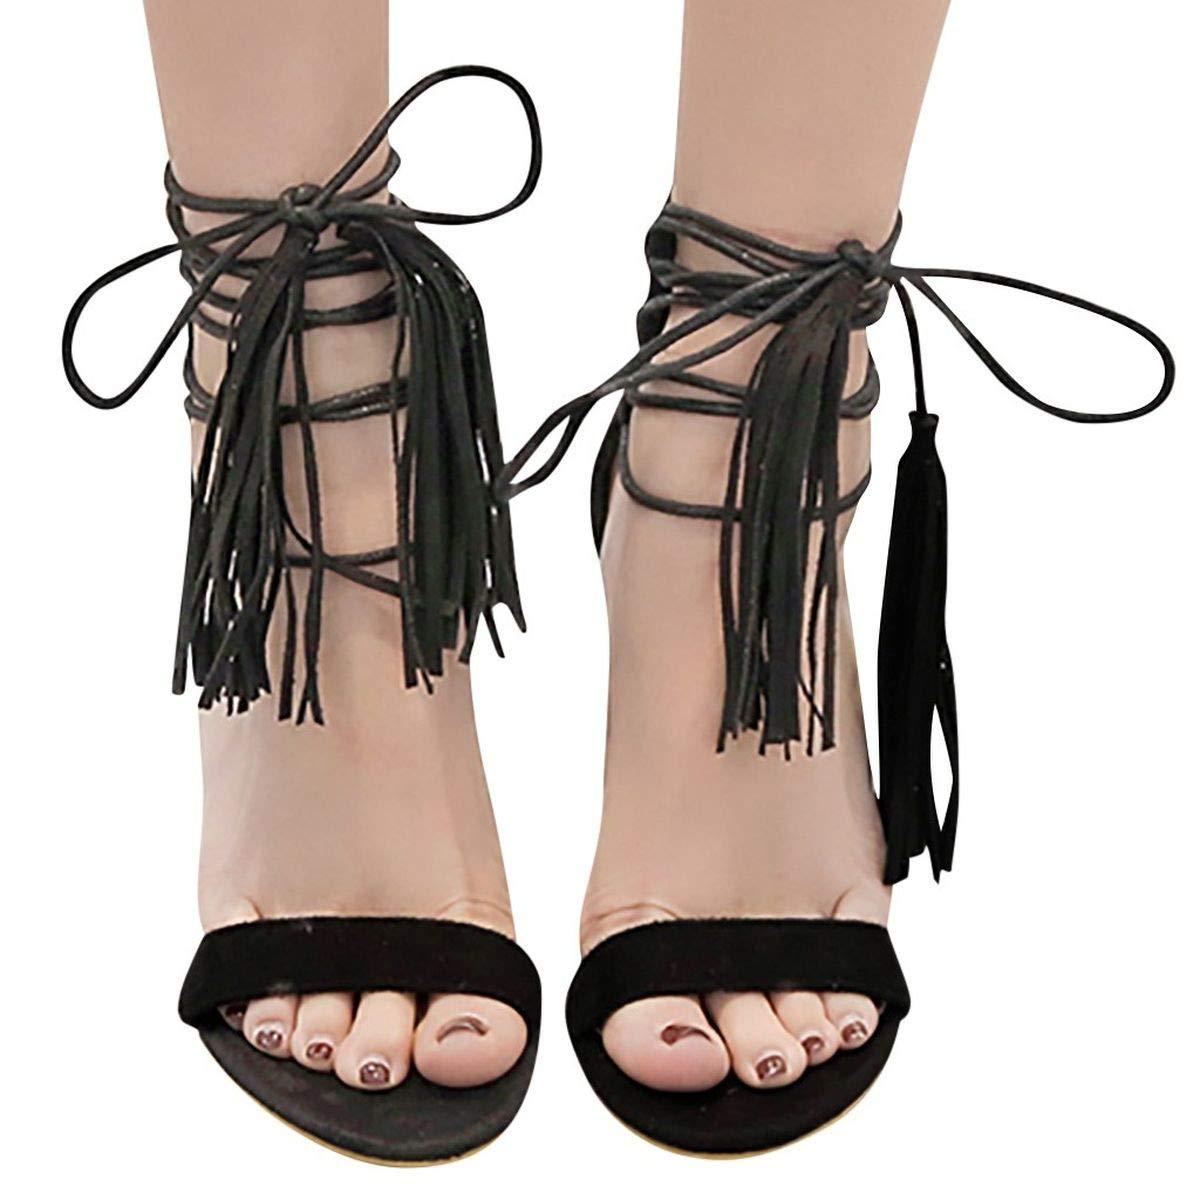 Heeled Sandals, Womens Fringe Strap Open Toe High Heel Sandals Slender Stiletto Heel and Wrap-Around Self-Tied Straps (Black, 6.5)